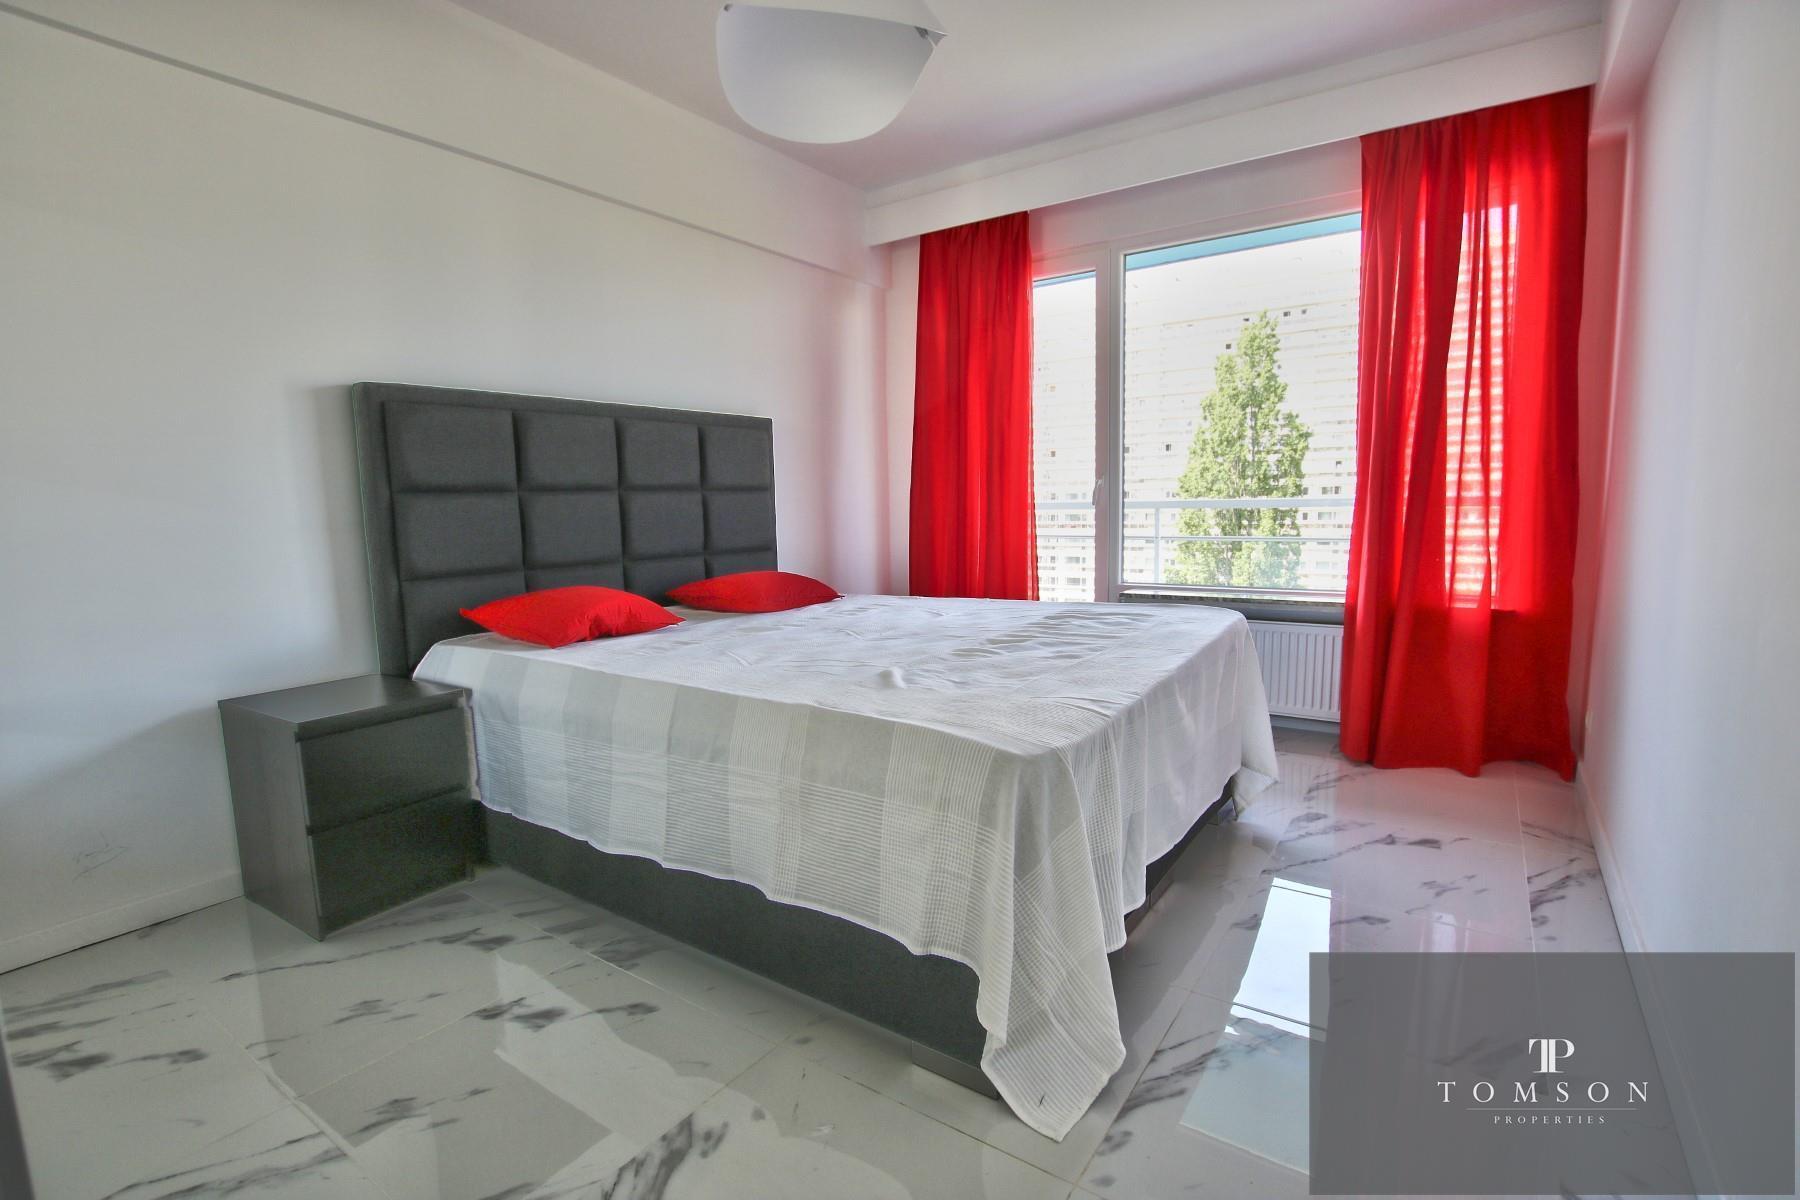 Appartement - Woluwe-Saint-Lambert - #4530510-8